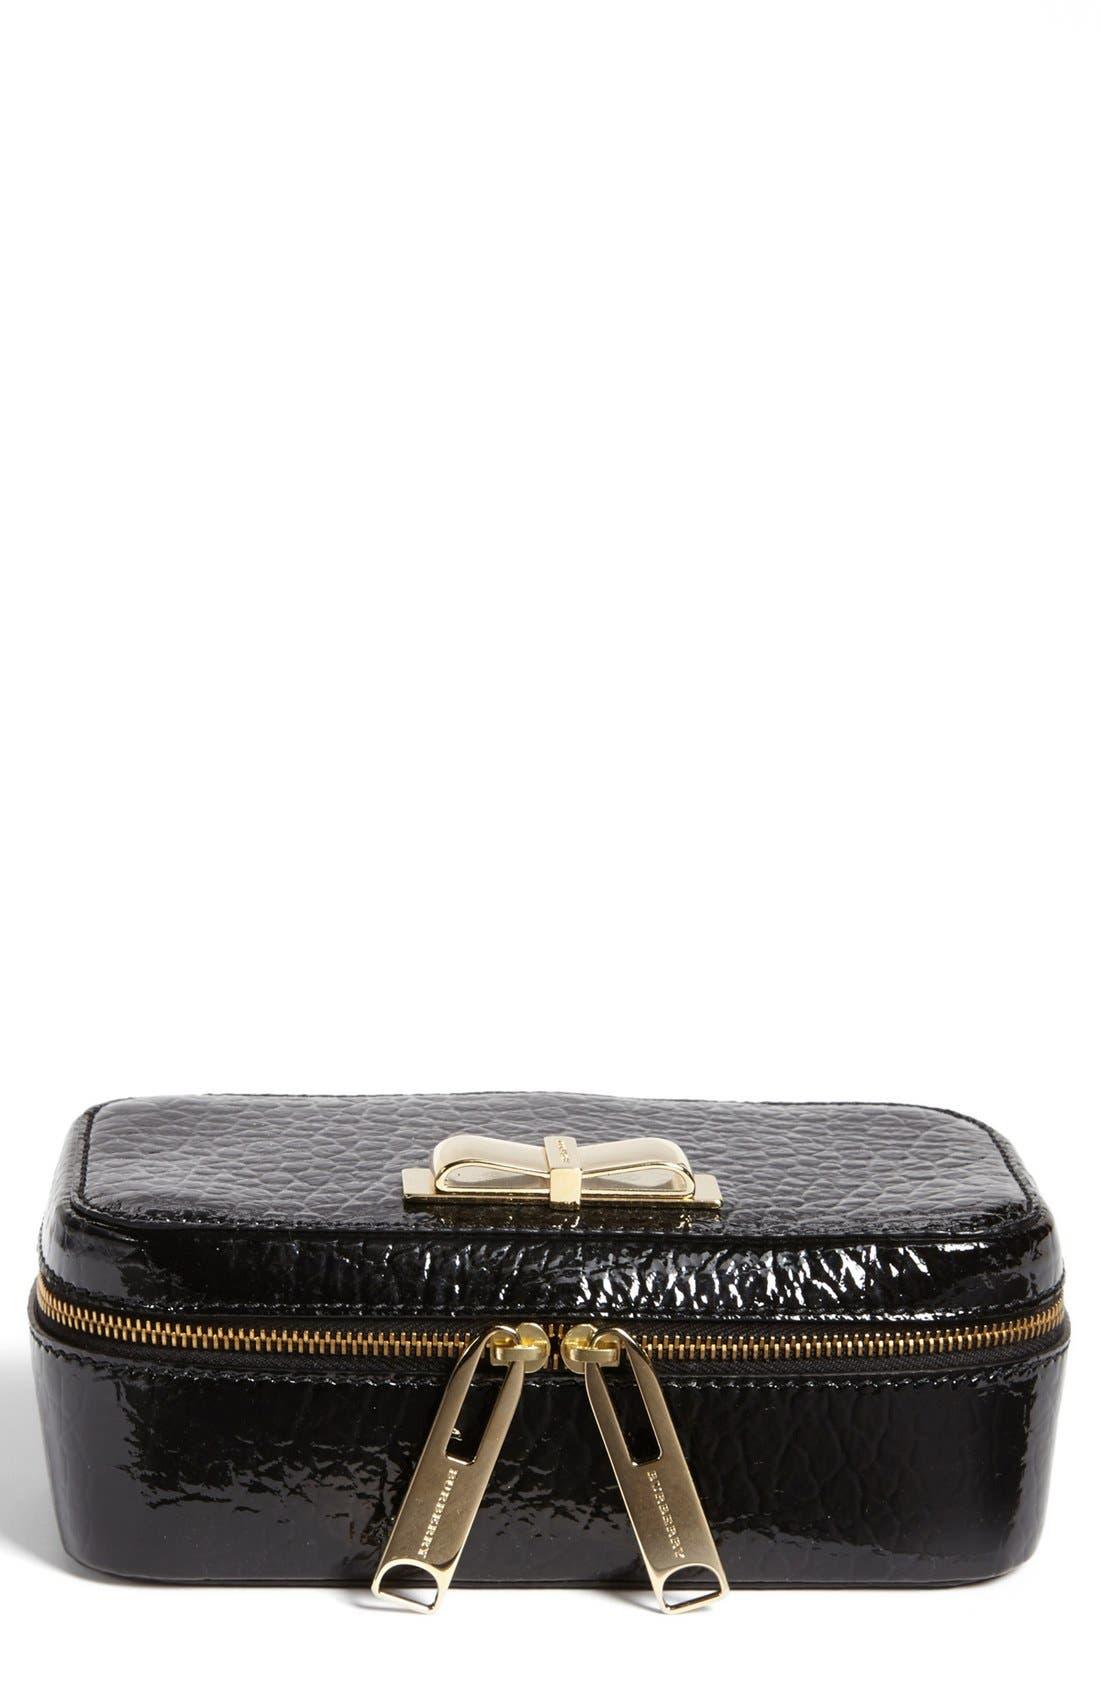 Main Image - Burberry 'Cassel' Cosmetics Case